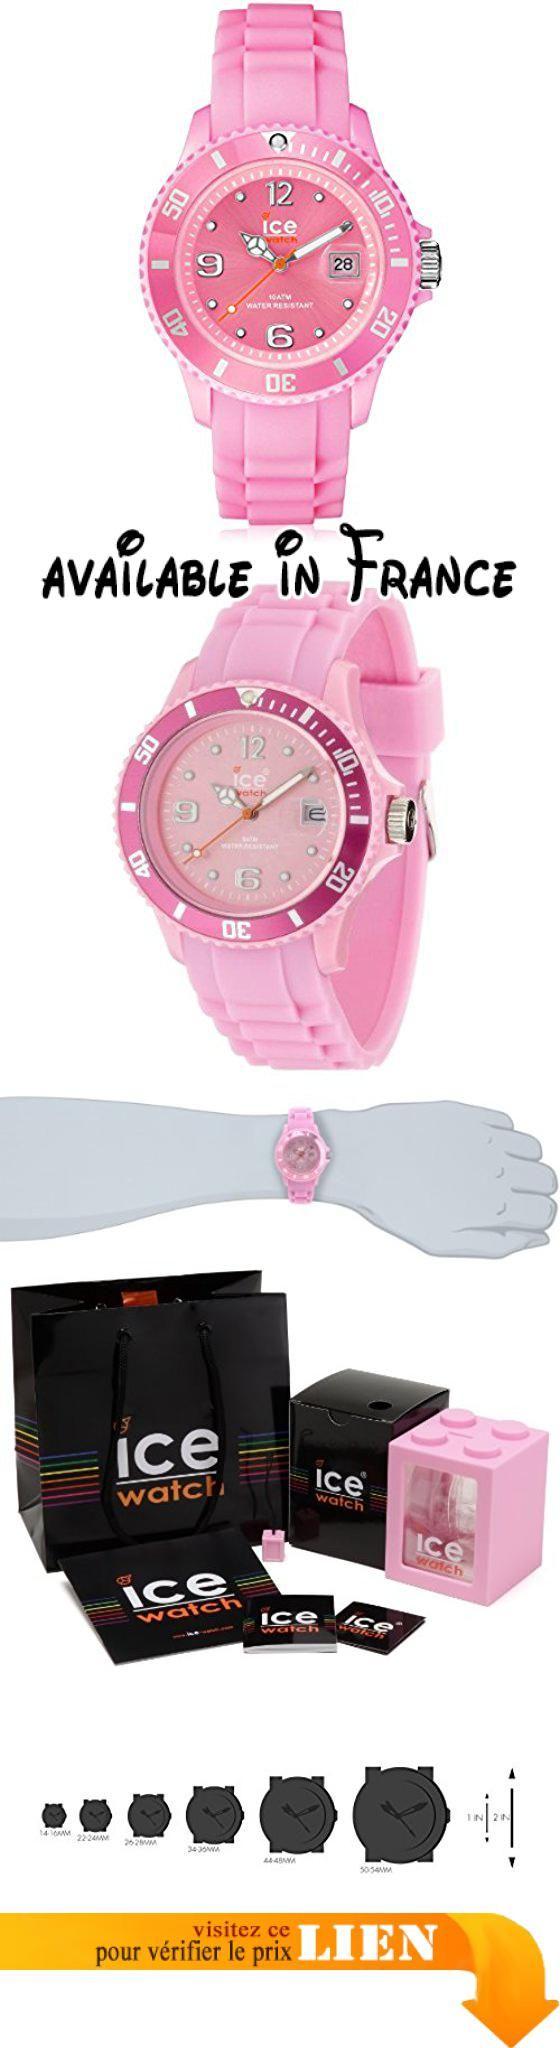 B0037NZ4EY   Ice-Watch - ICE forever Pink - Montre rose pour femme avec  bracelet 99e5e51d3246